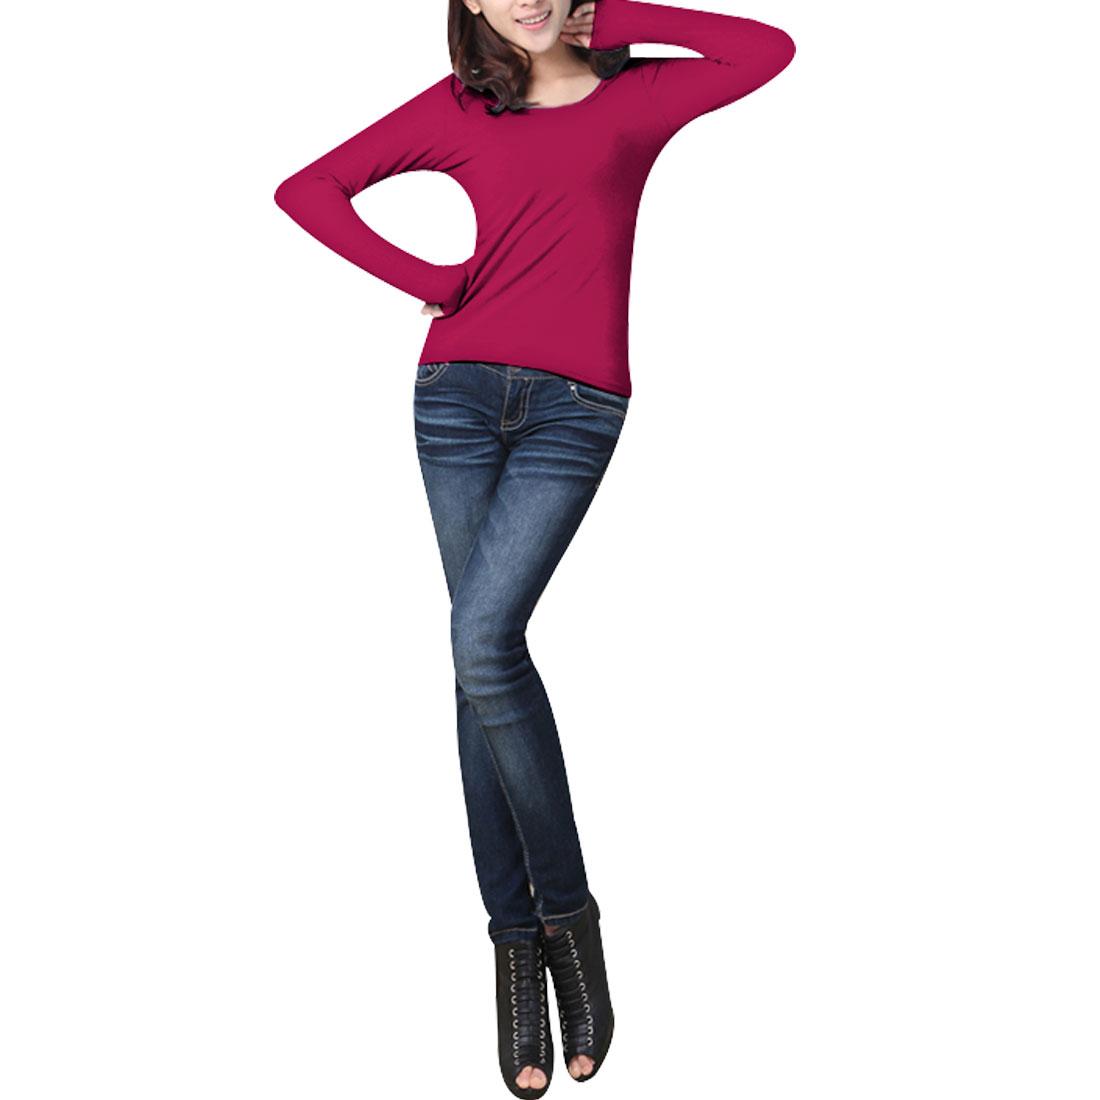 Women Sumemr Charming Double U Neck Solid Fuchsia T-Shirt Blouse XS